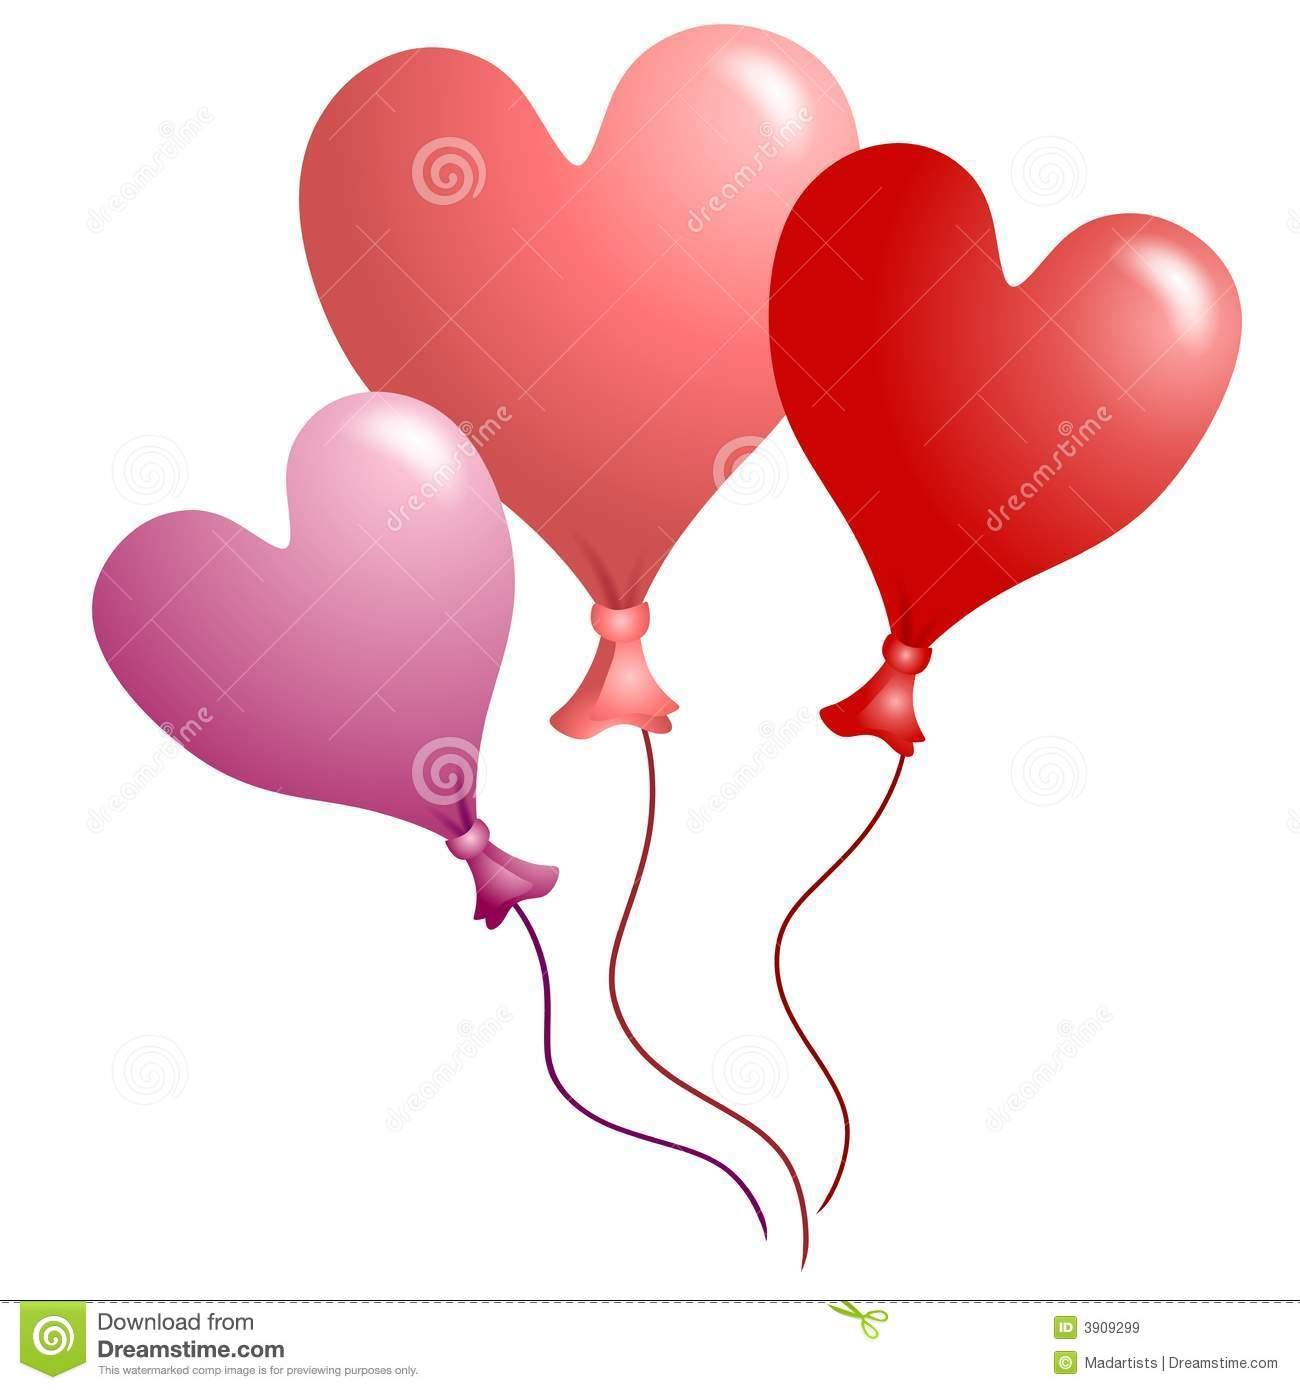 Balloon clipart valentines. Valentine balloons s day